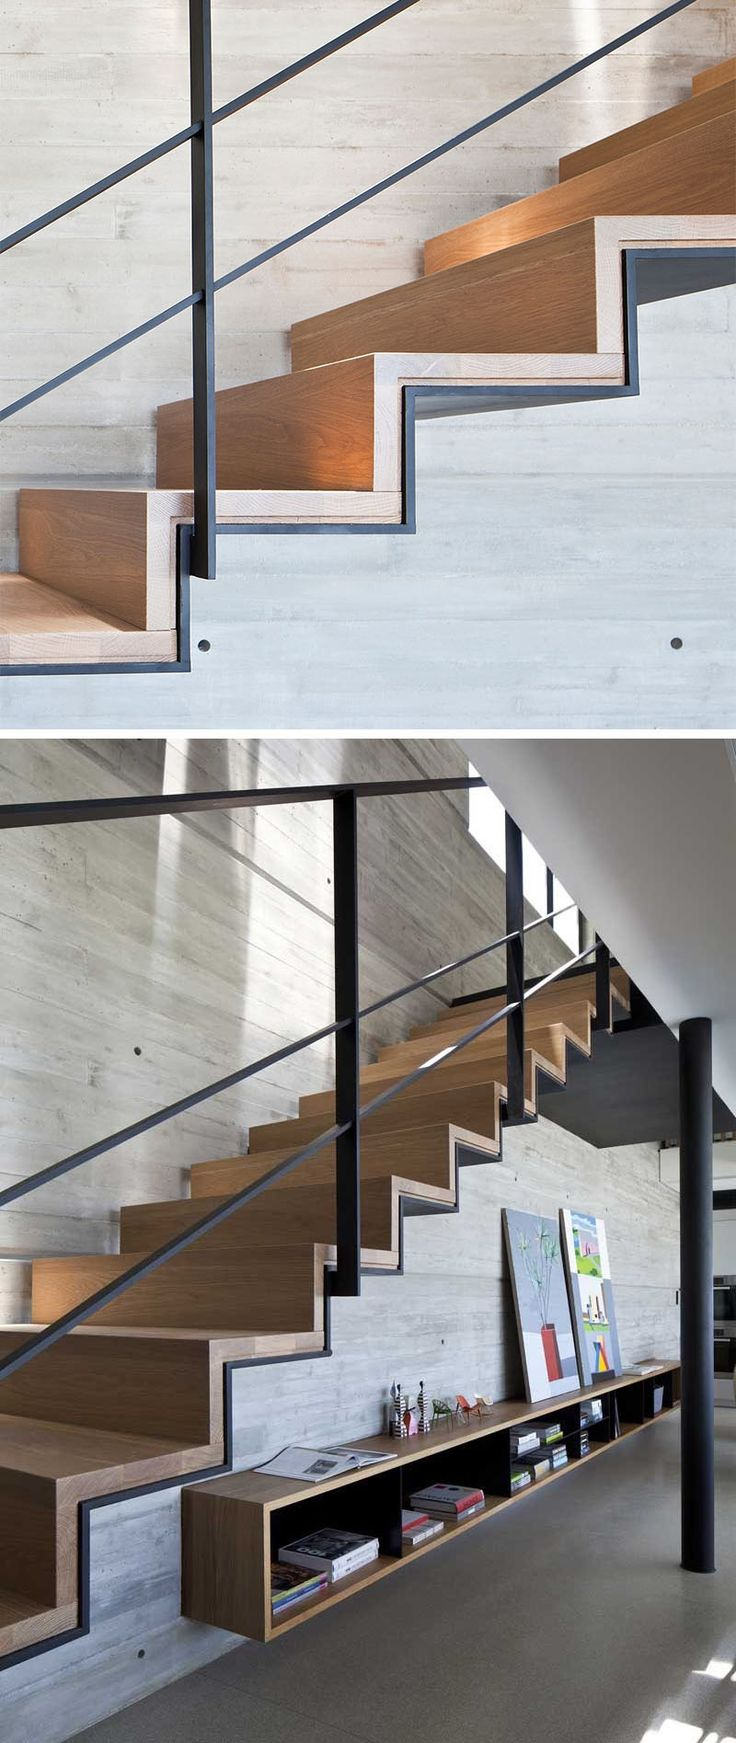 best 25 handrail ideas ideas on pinterest stair. Black Bedroom Furniture Sets. Home Design Ideas